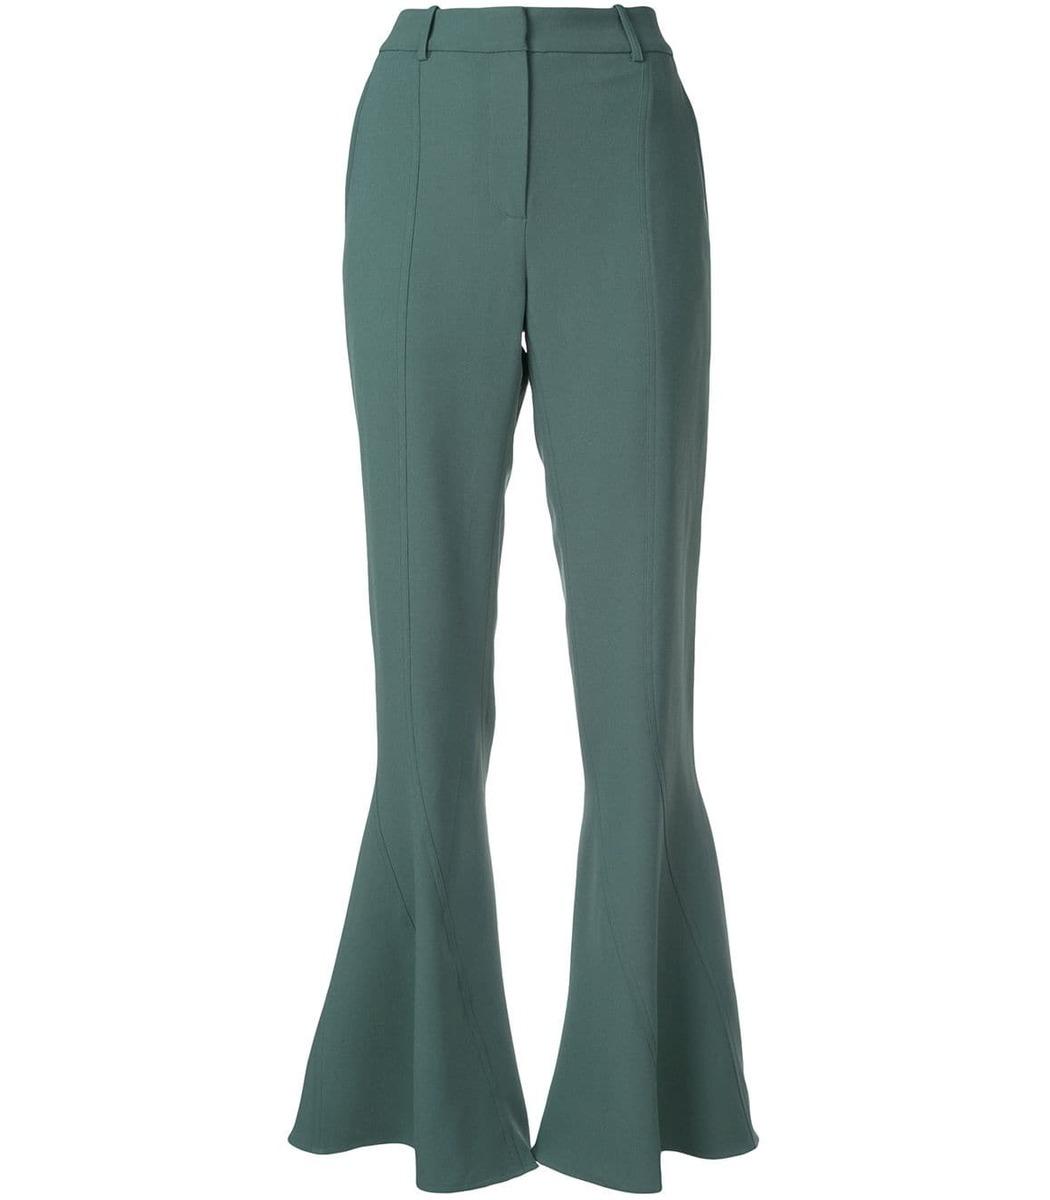 Sies Marjan Green Flared Trousers